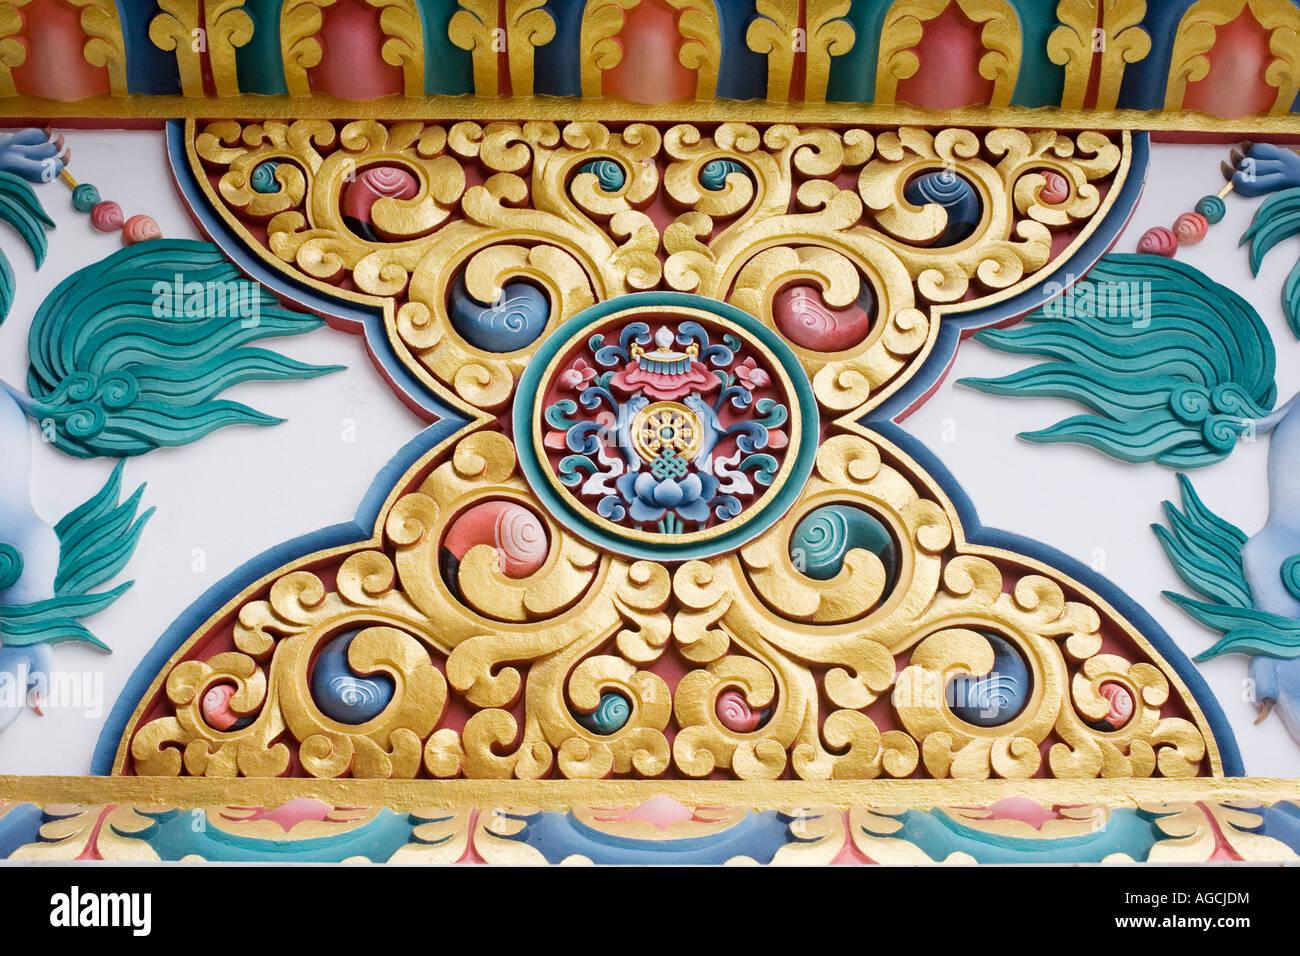 Tibetan Buddhism Old Wall Painting Stock Photos & Tibetan Buddhism ...